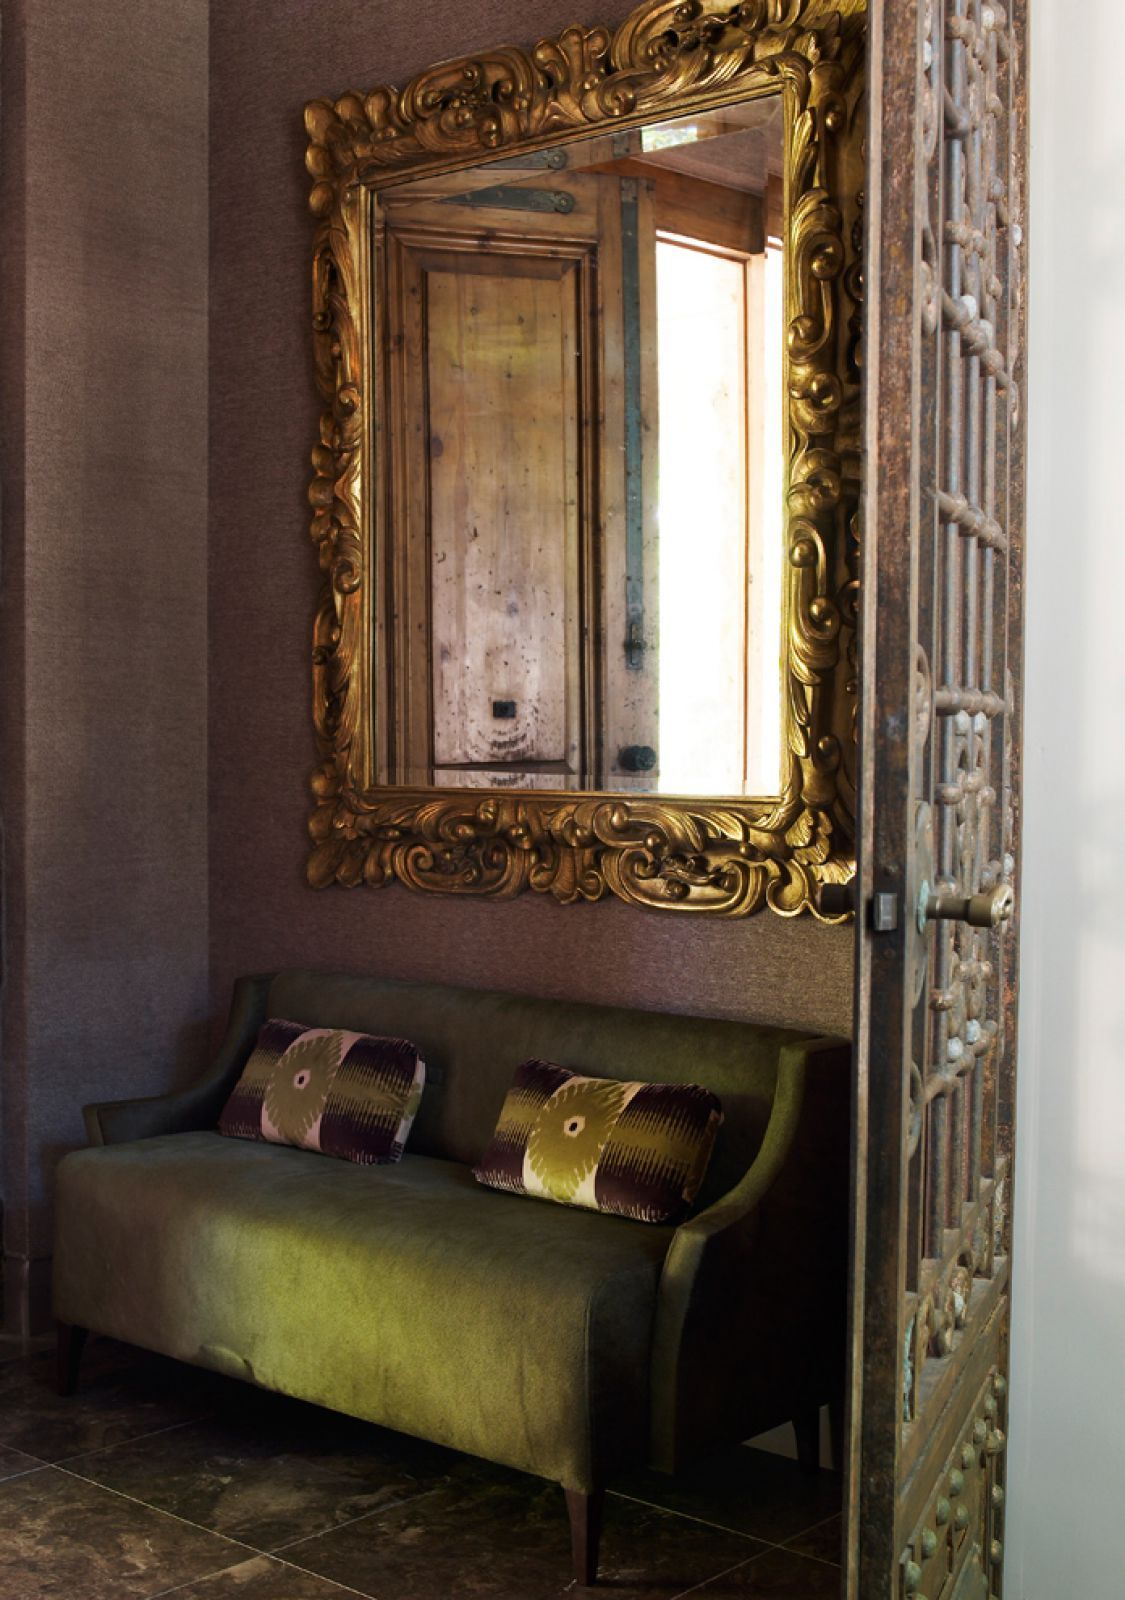 World Best Interior Designer Featuring Chistian Lyon Design For More Inspiration See Also Http Www Brabbu Com En Diseno De Interiores Hogar Interiores